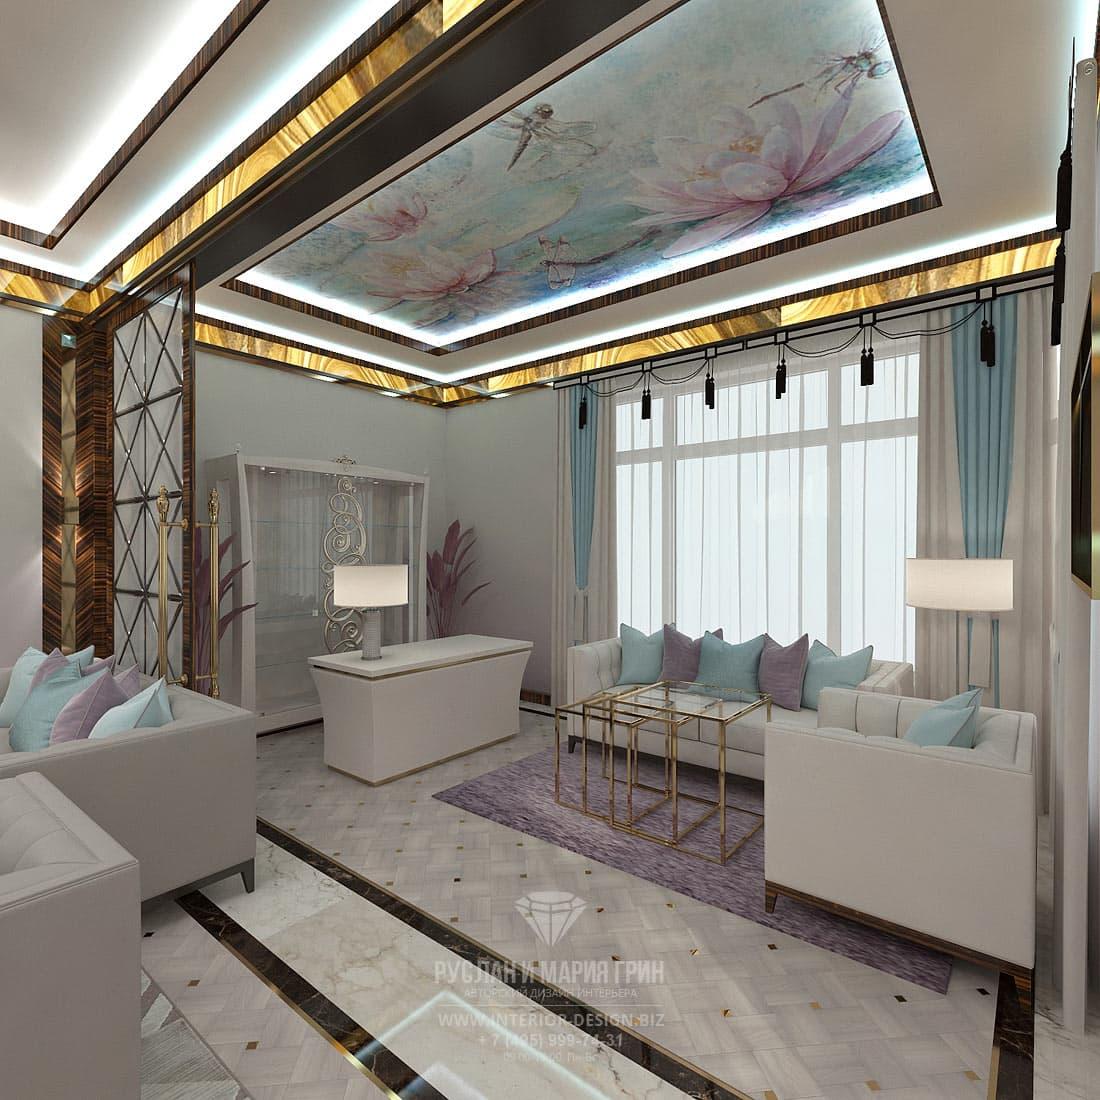 Дизайн квартиры 2019 в стиле ар-деко